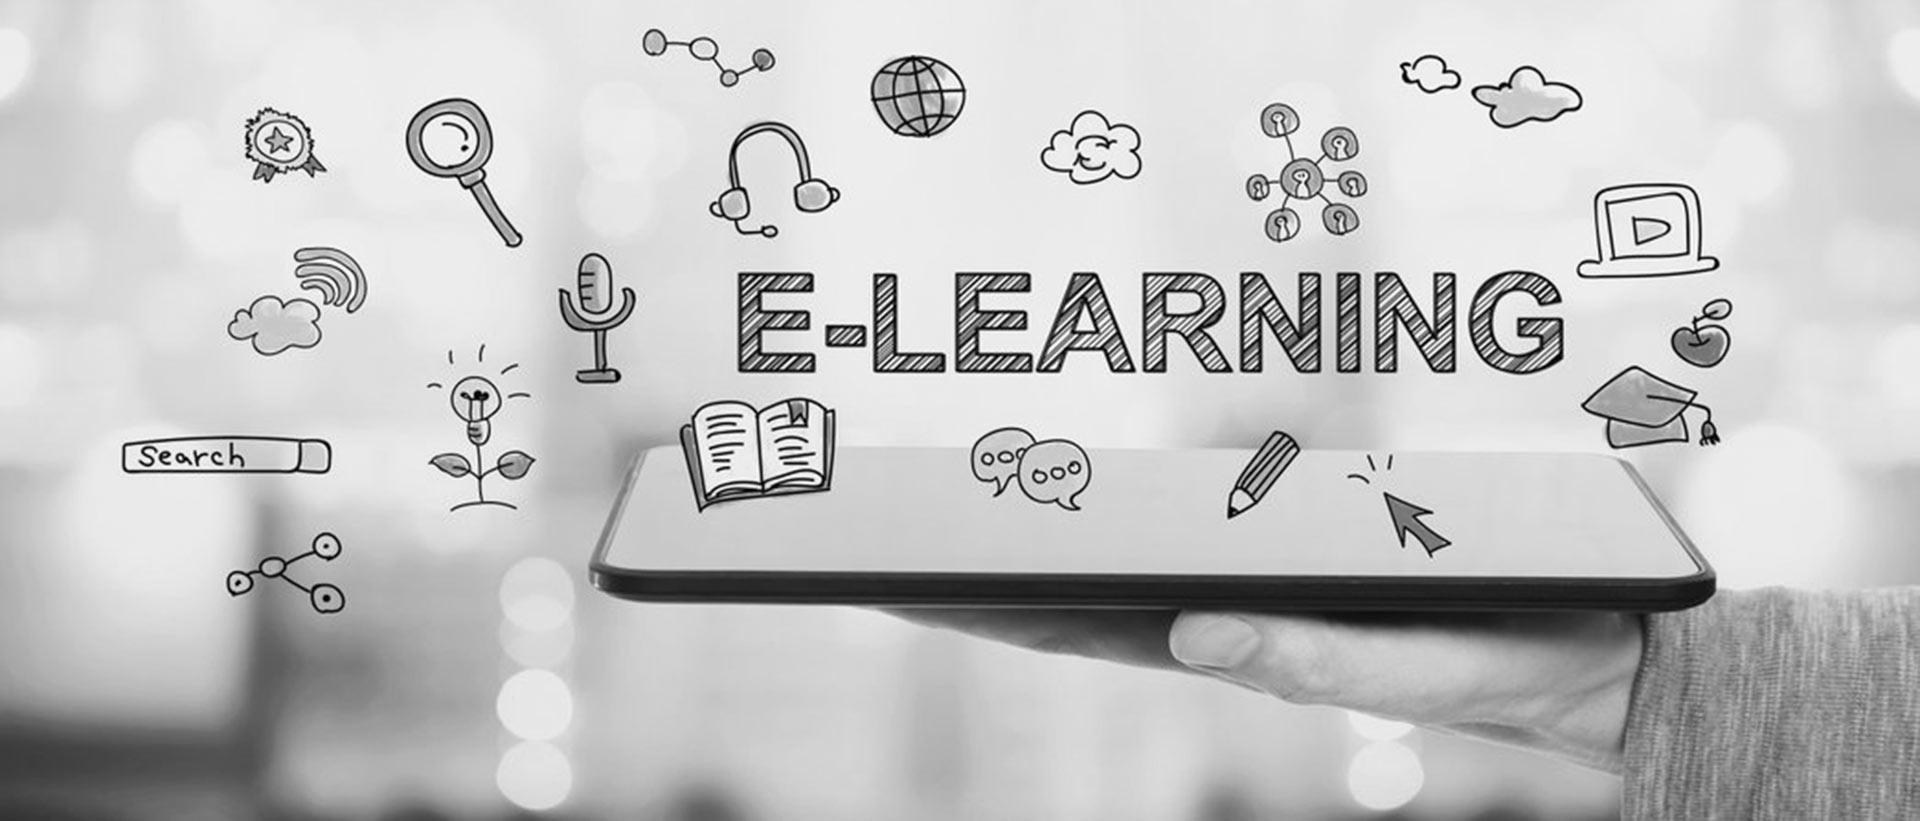 Learning Management System - Einführung